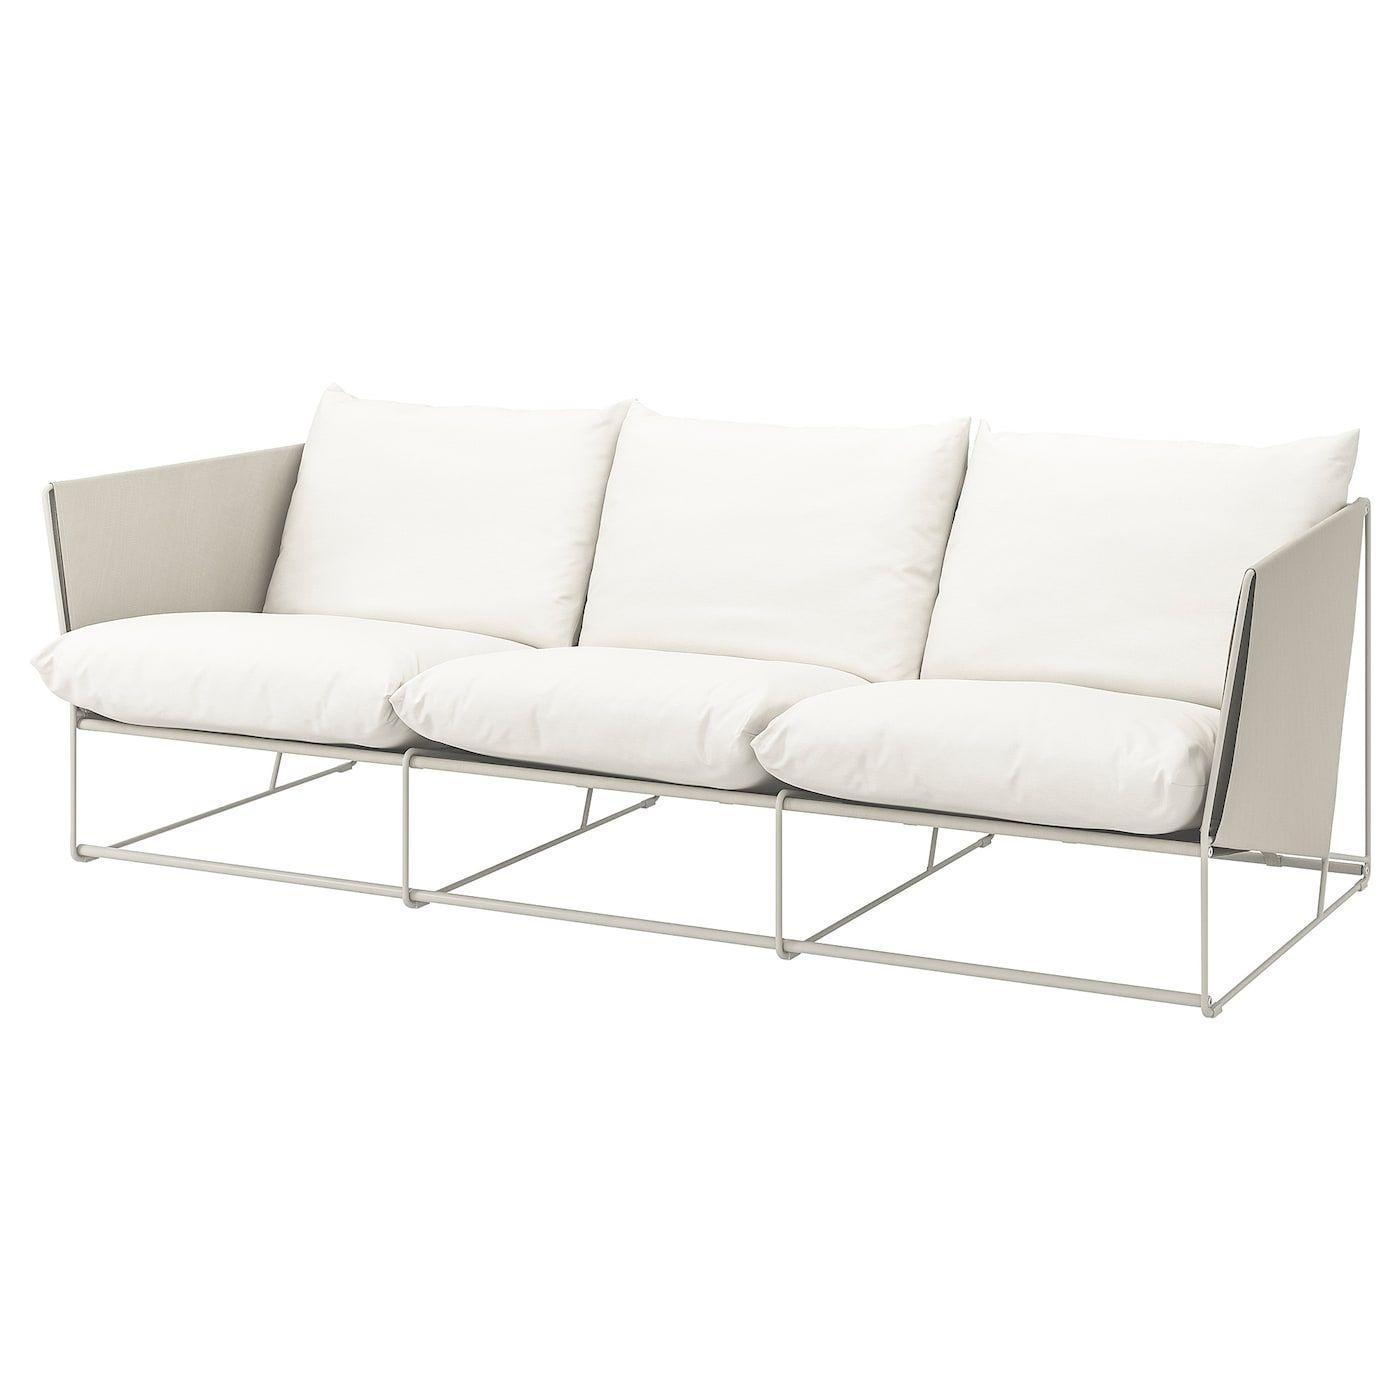 Havsten 3er Sofa Drinnen Draussen Beige Ikea Deutschland 3er Sofa Sofa Kissen Sofa